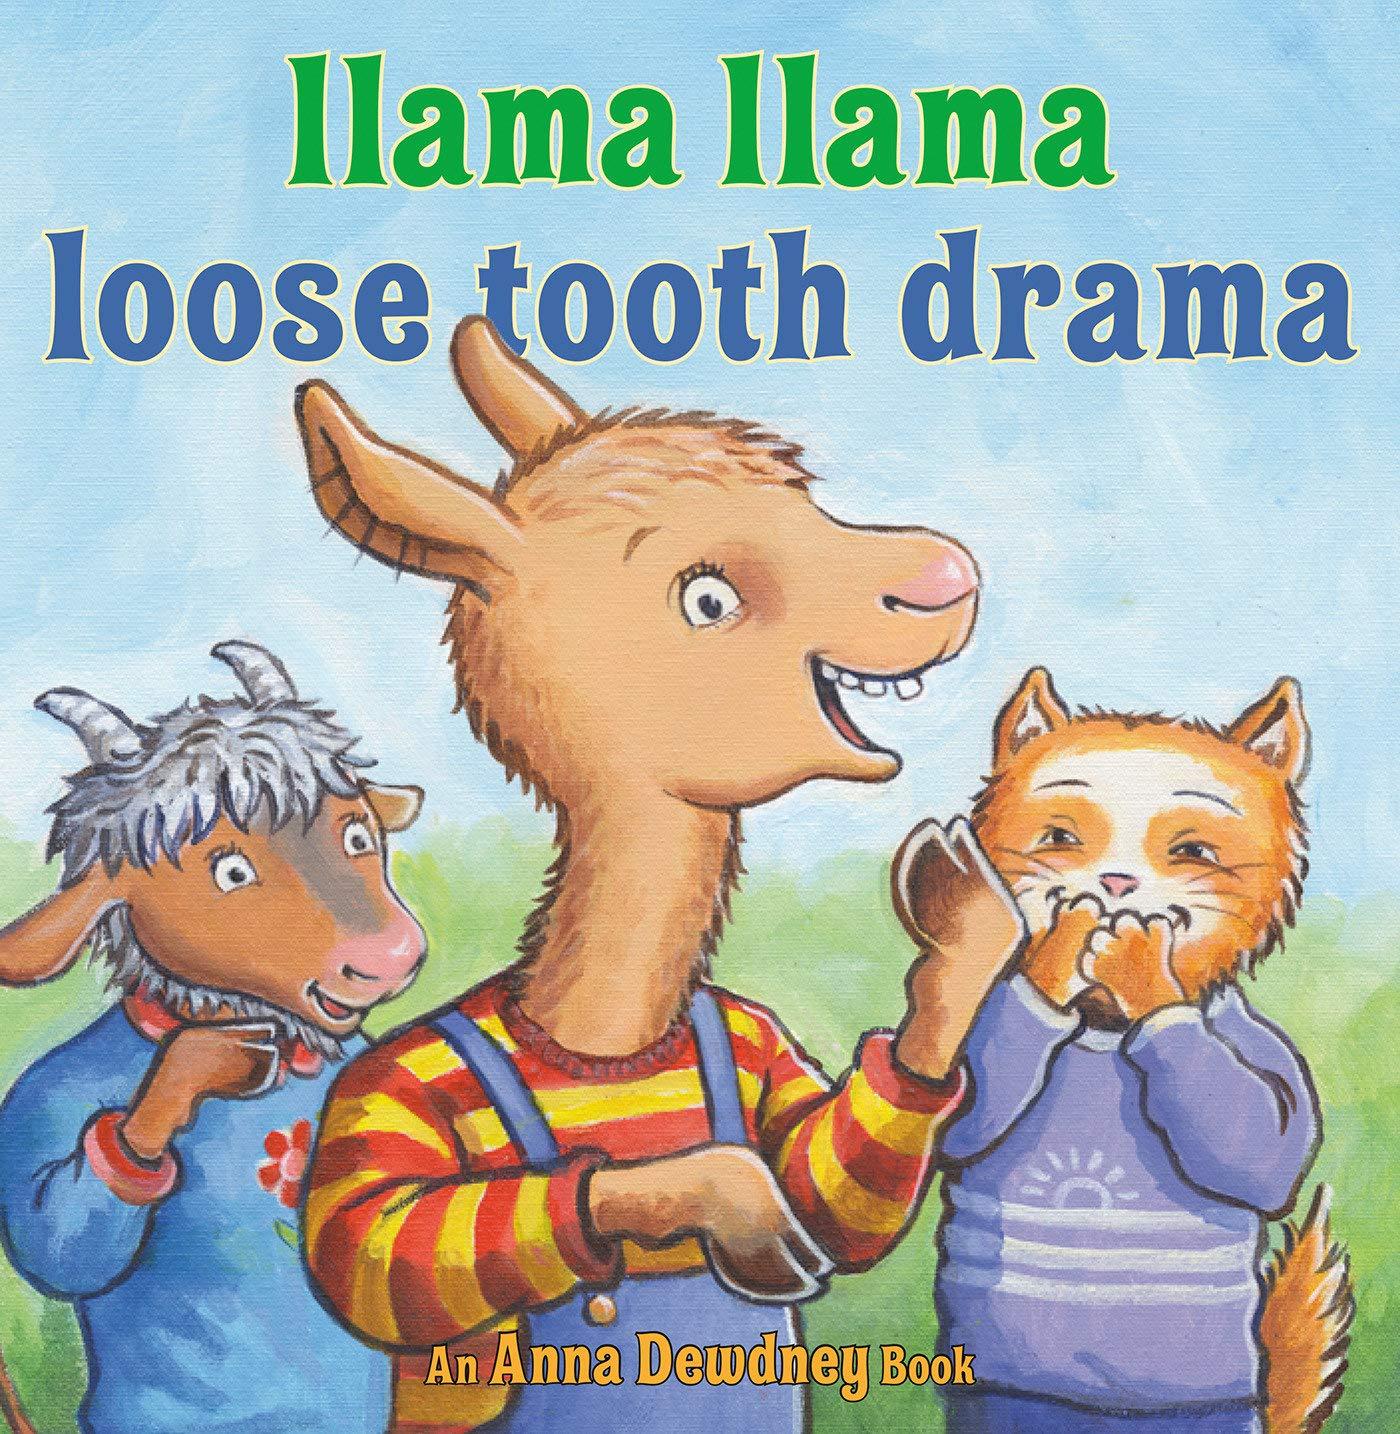 Amazon.com: Llama Llama Loose Tooth Drama (9780593206034): Dewdney, Anna,  Morrow, JT: Books